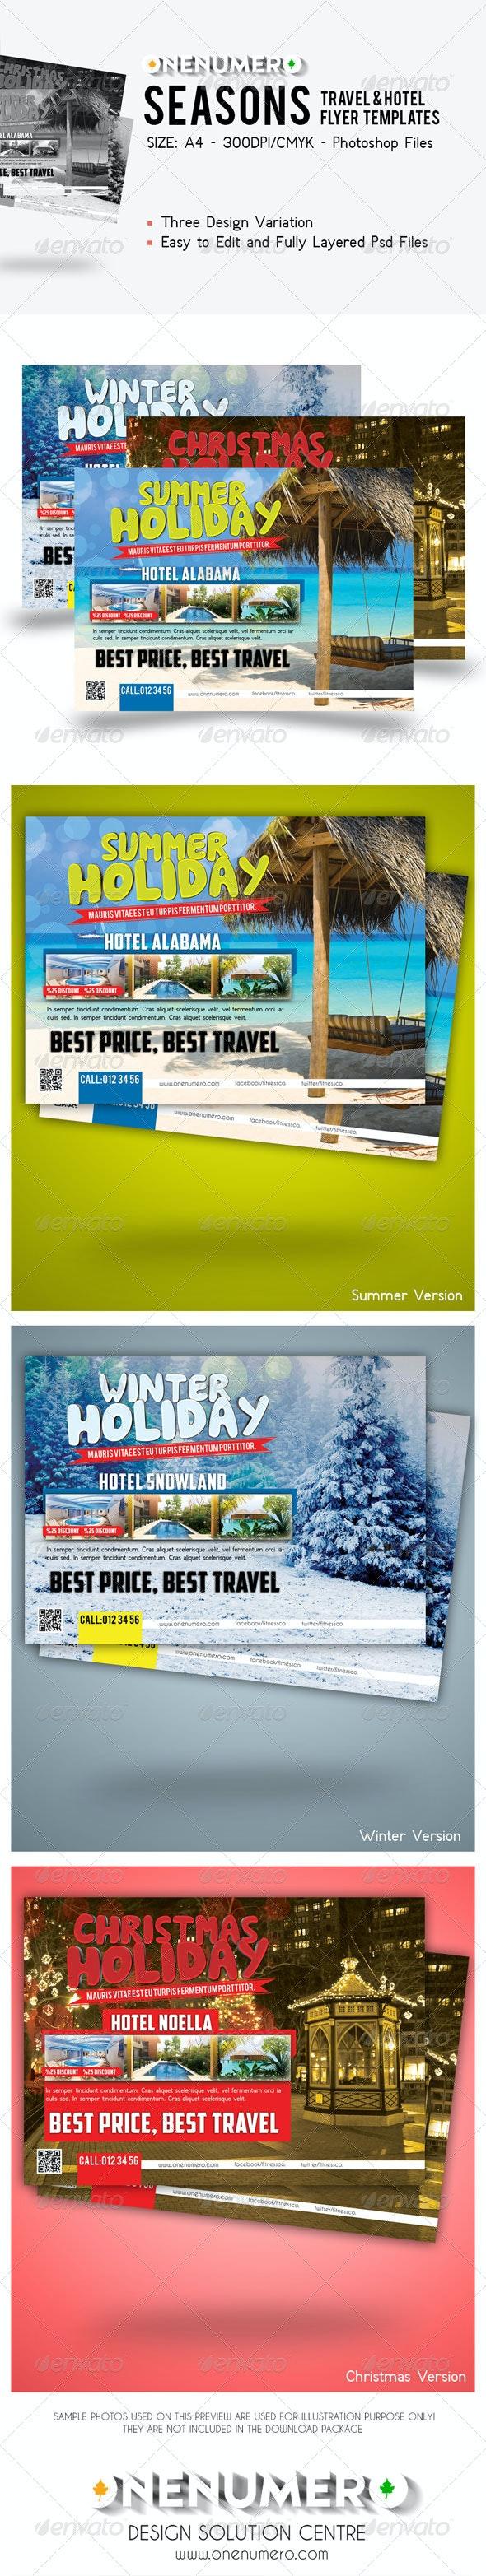 Seasons Travel - Hotel Flyer